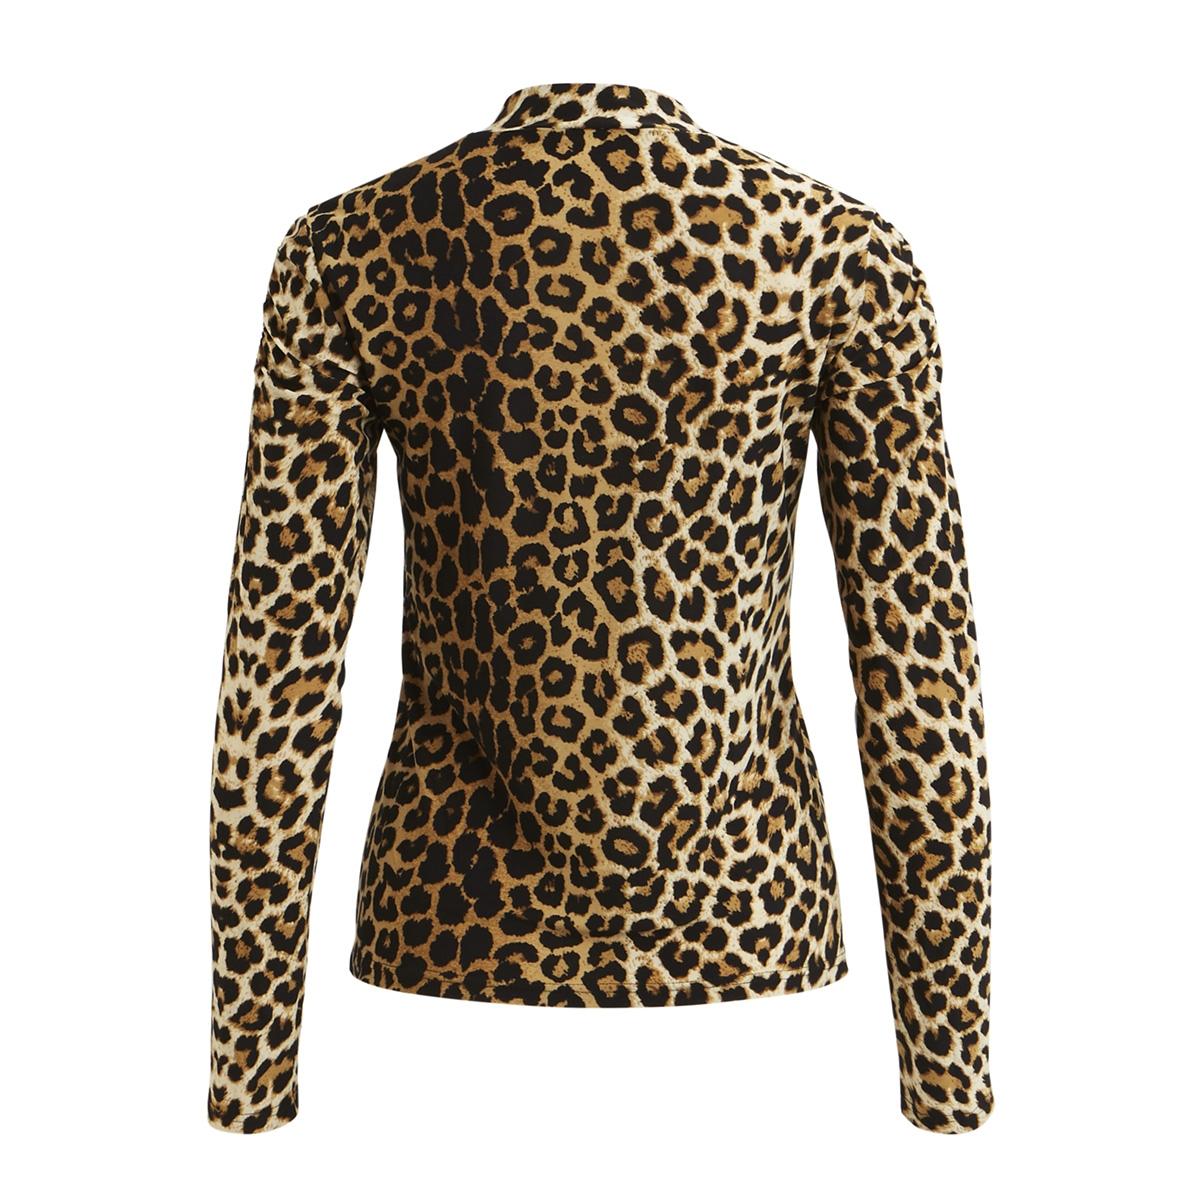 vitabene l/s top/rx 14048119 vila t-shirt black/animal